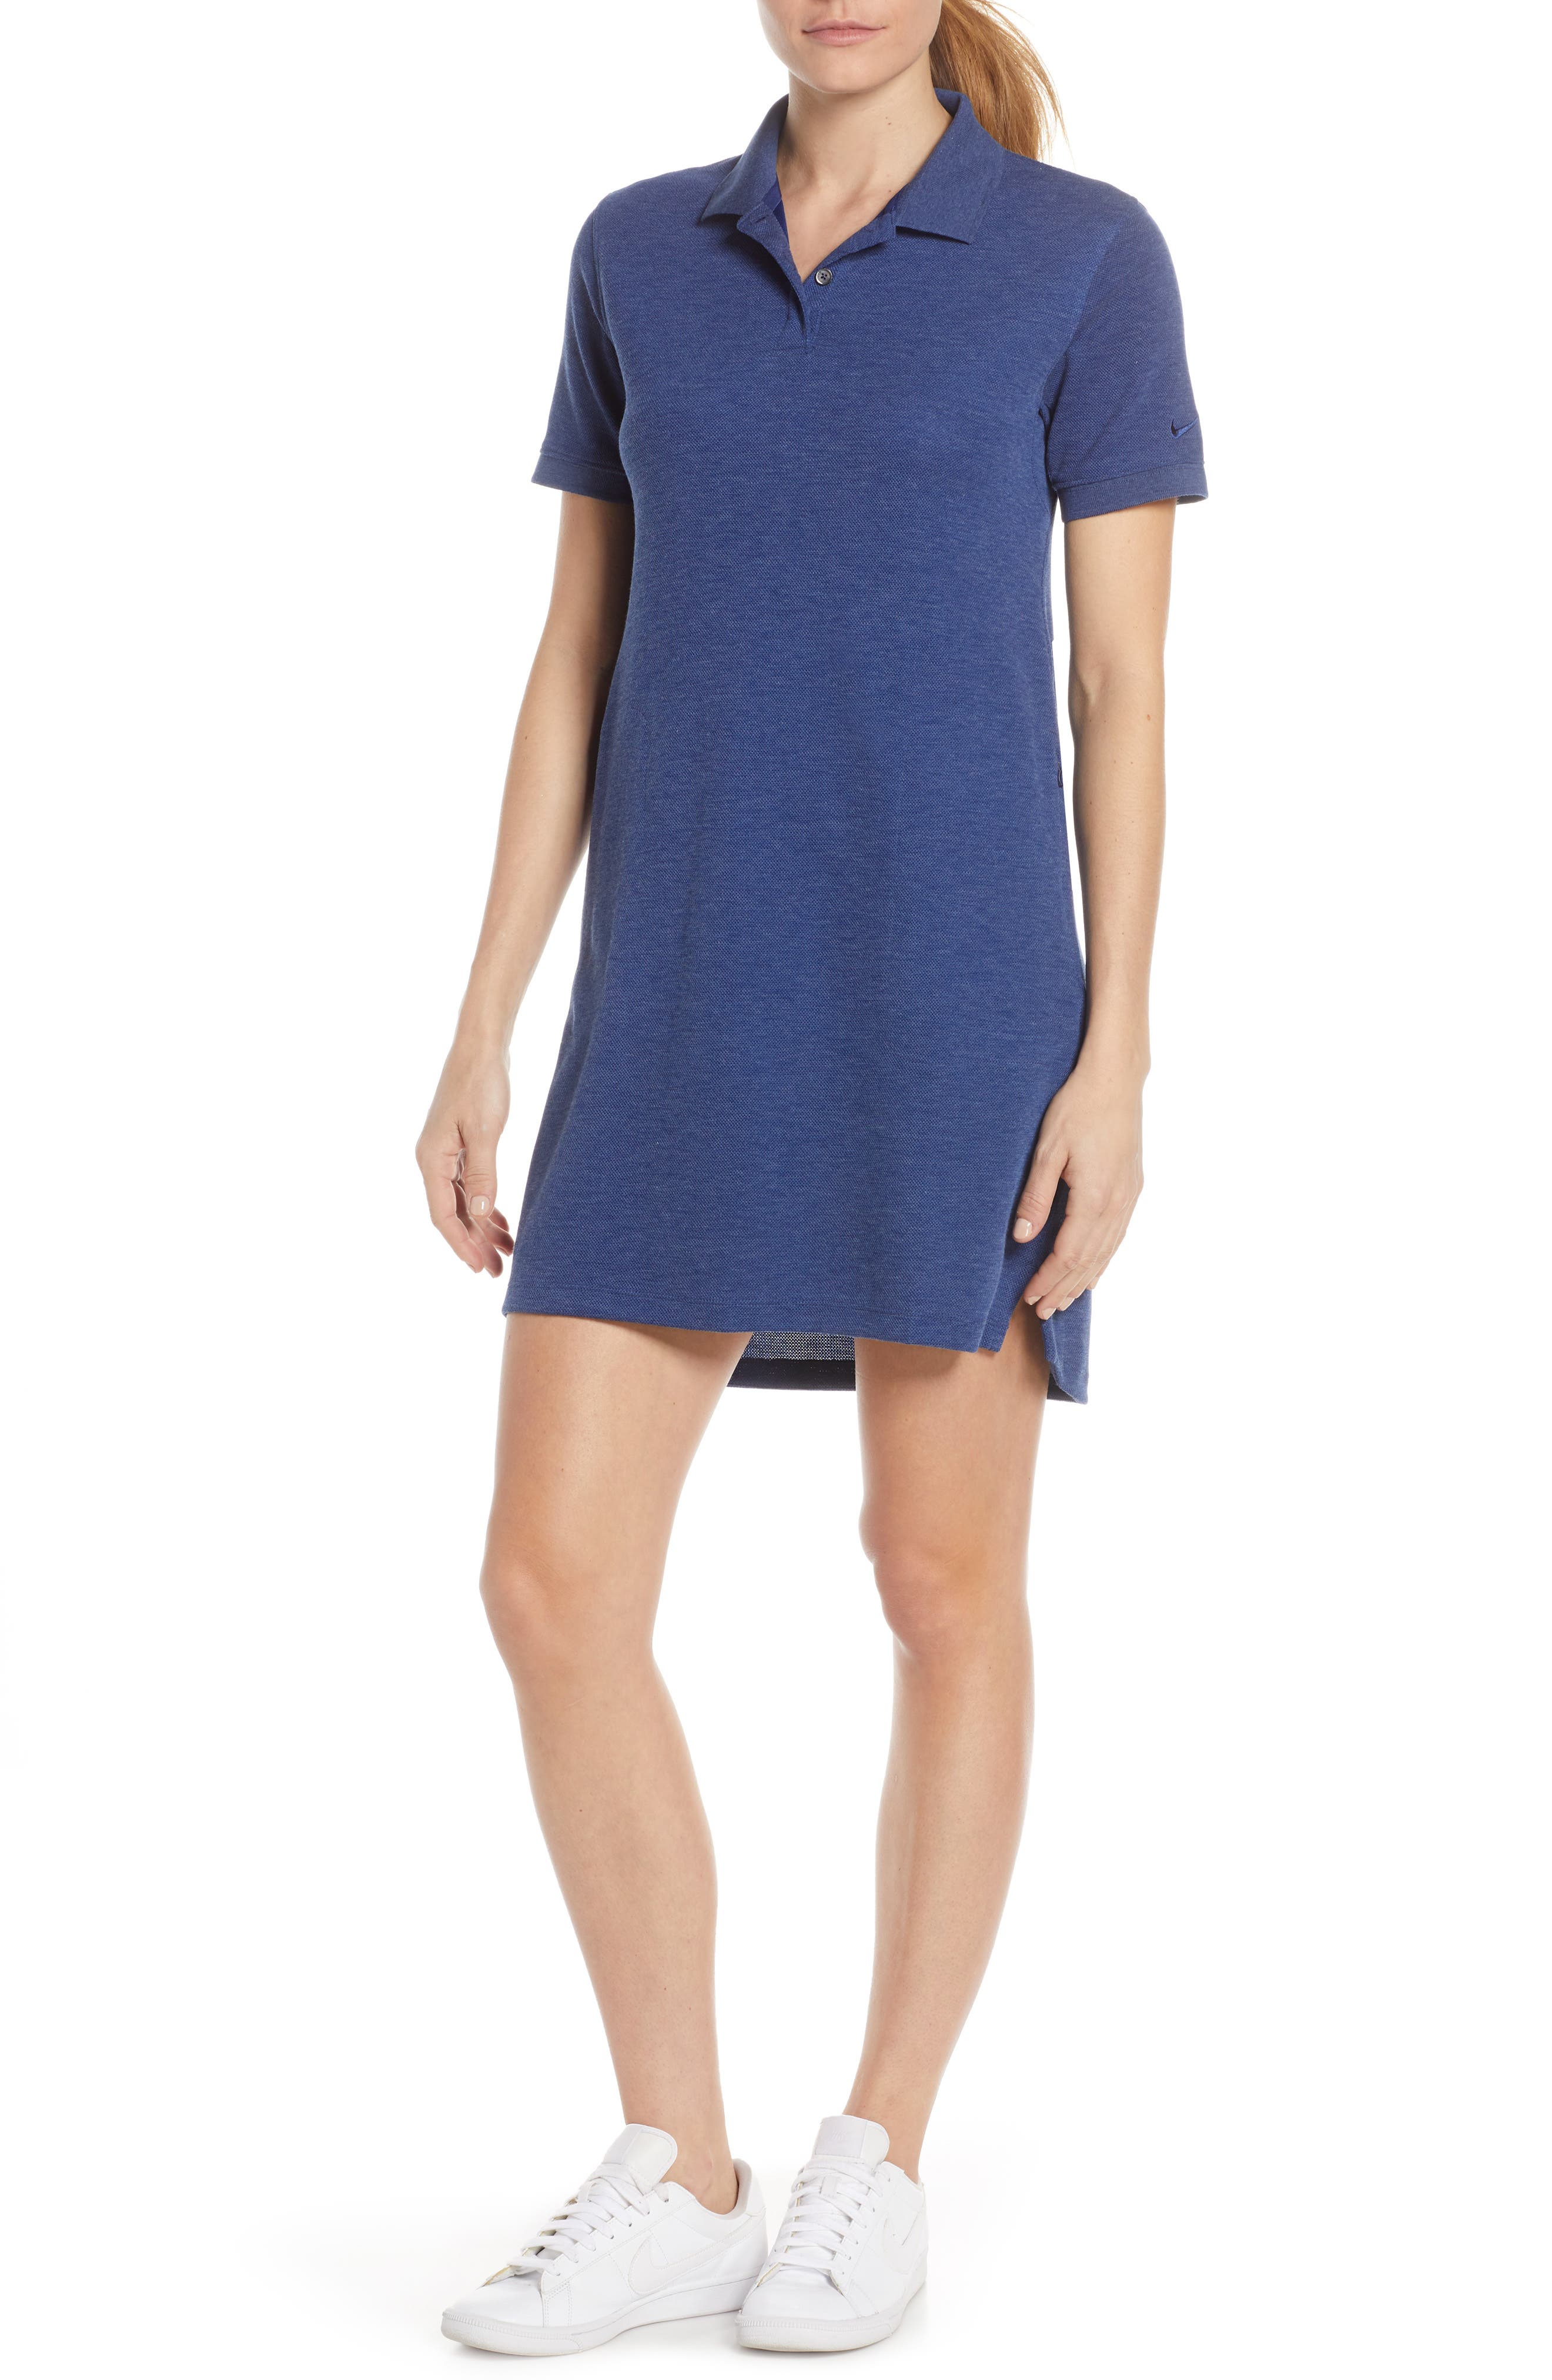 Nike Dri-Fit Polo Dress, Blue